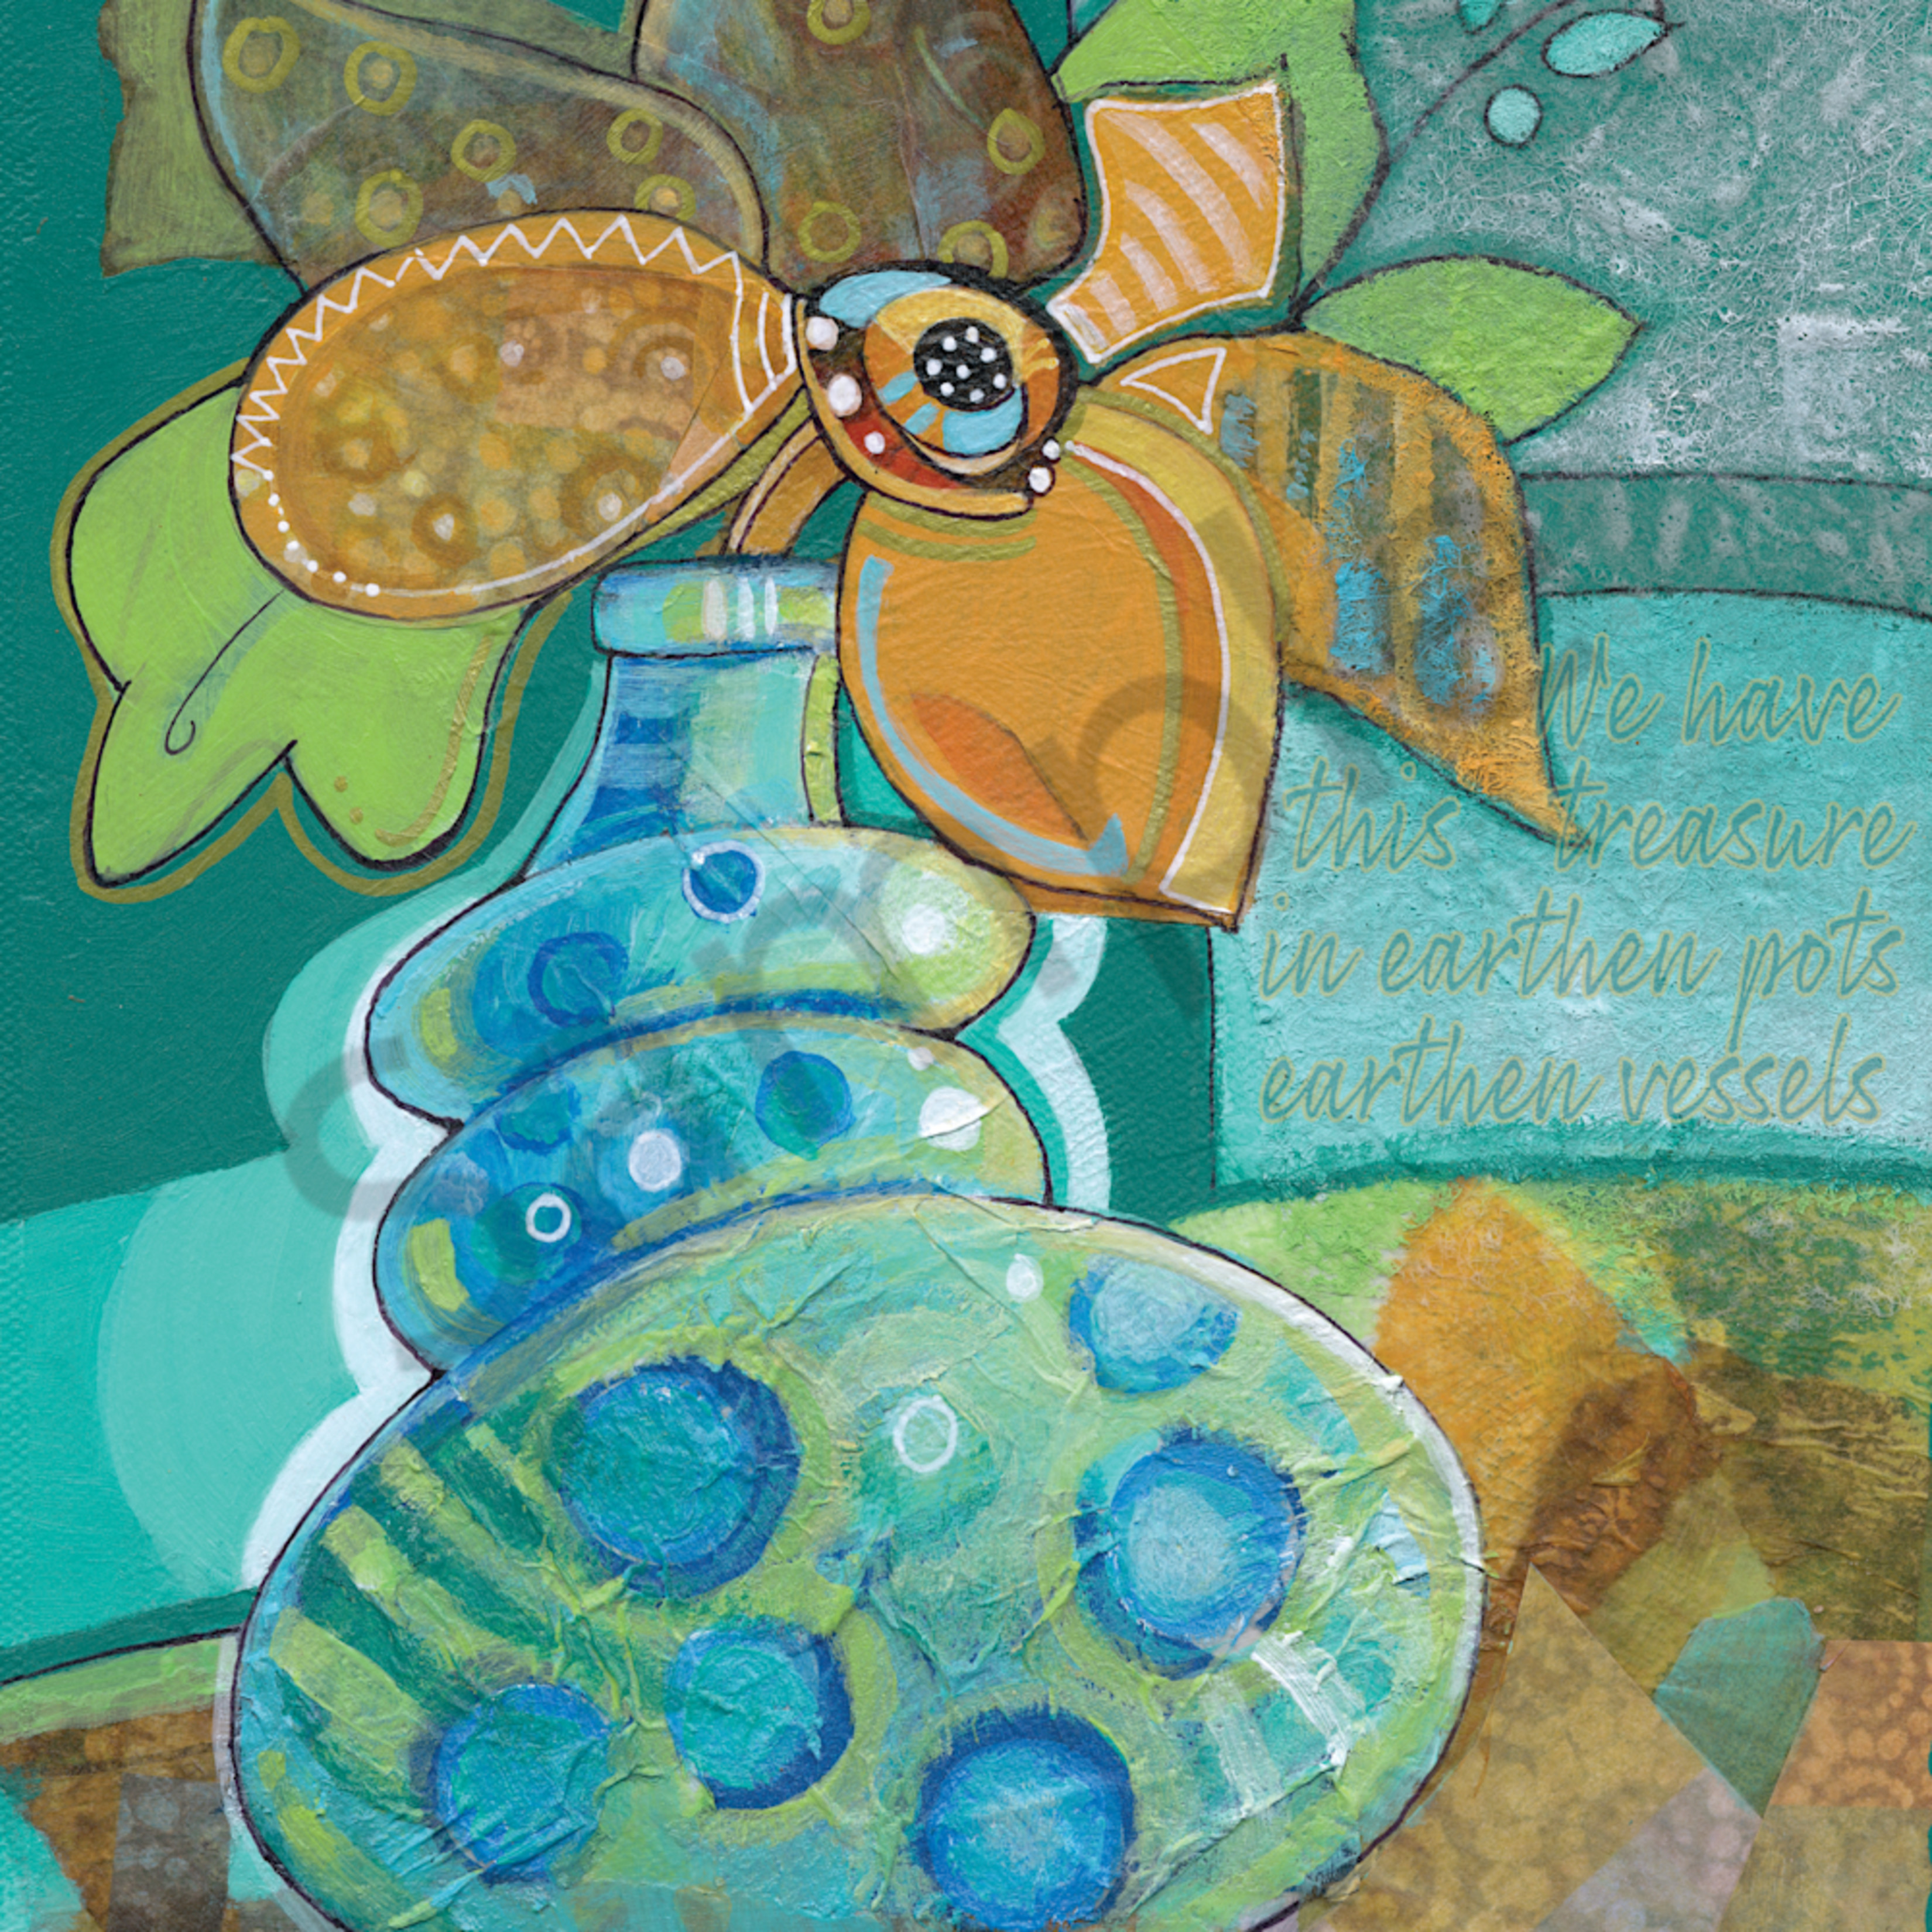 Treasure in earthen vessel linda by linda davis nfnrt8